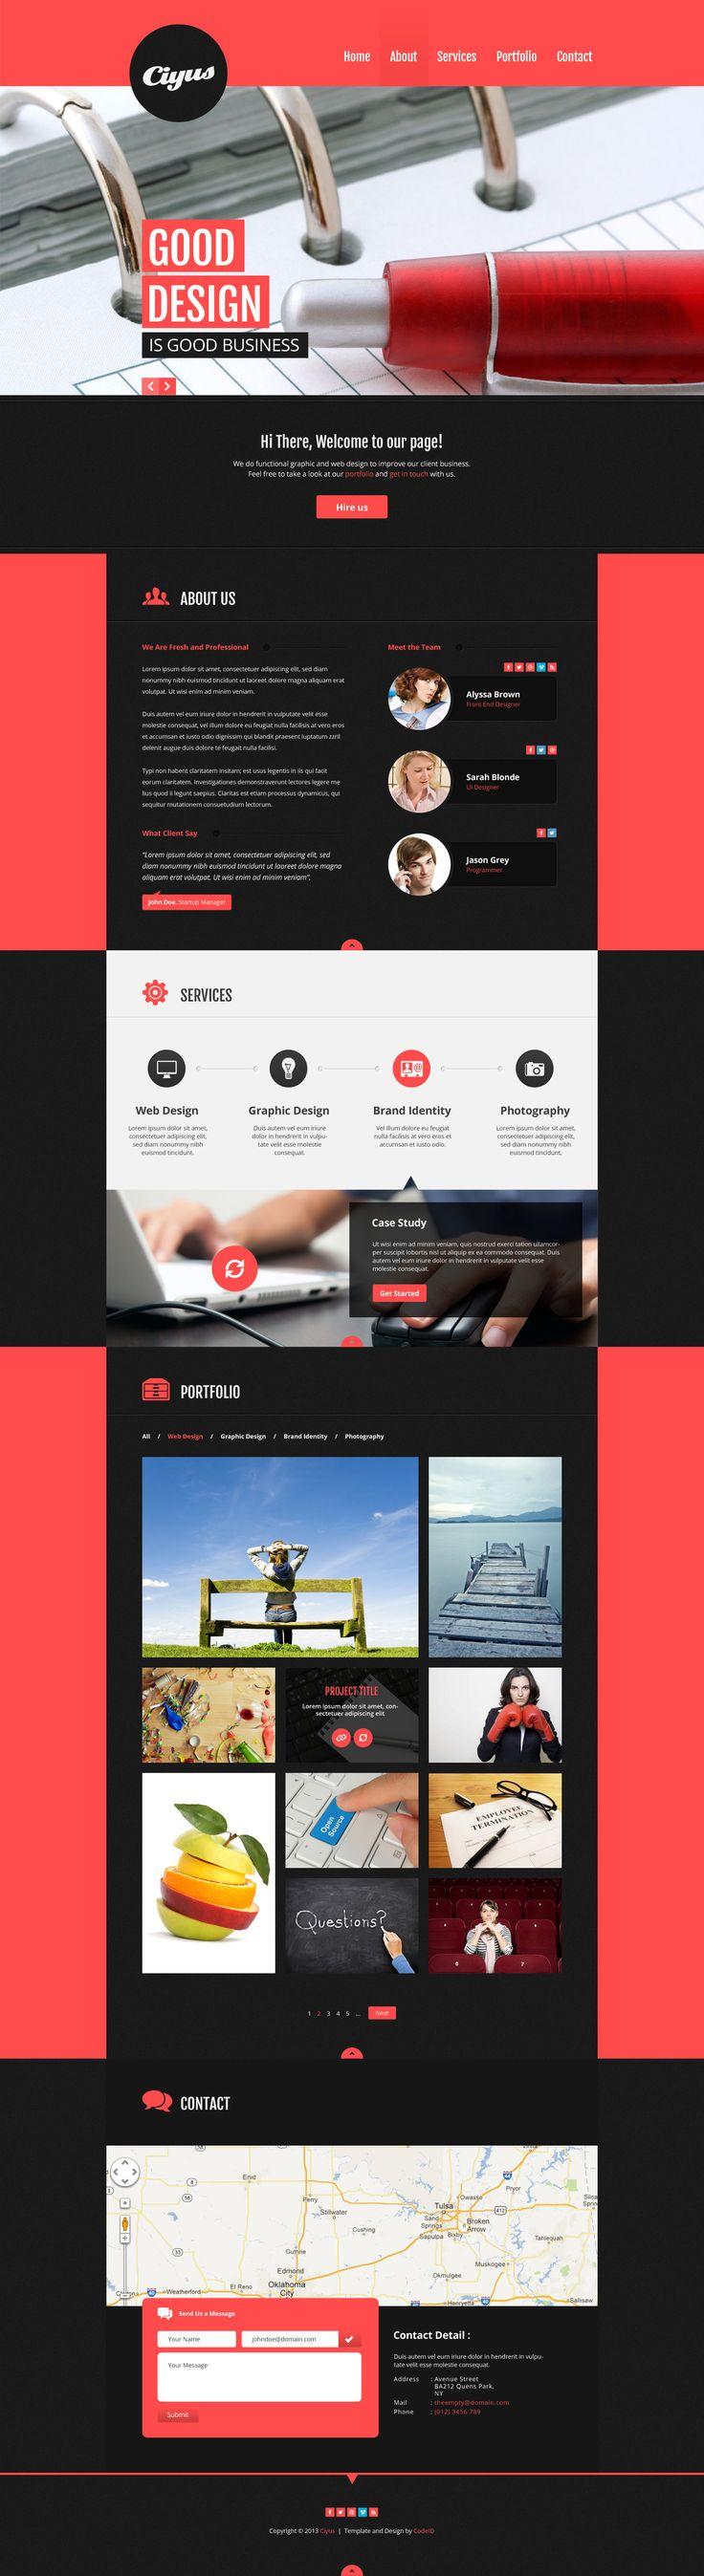 Web Design Ciyus - Single Page Portfolio - ThemeForest Previewer